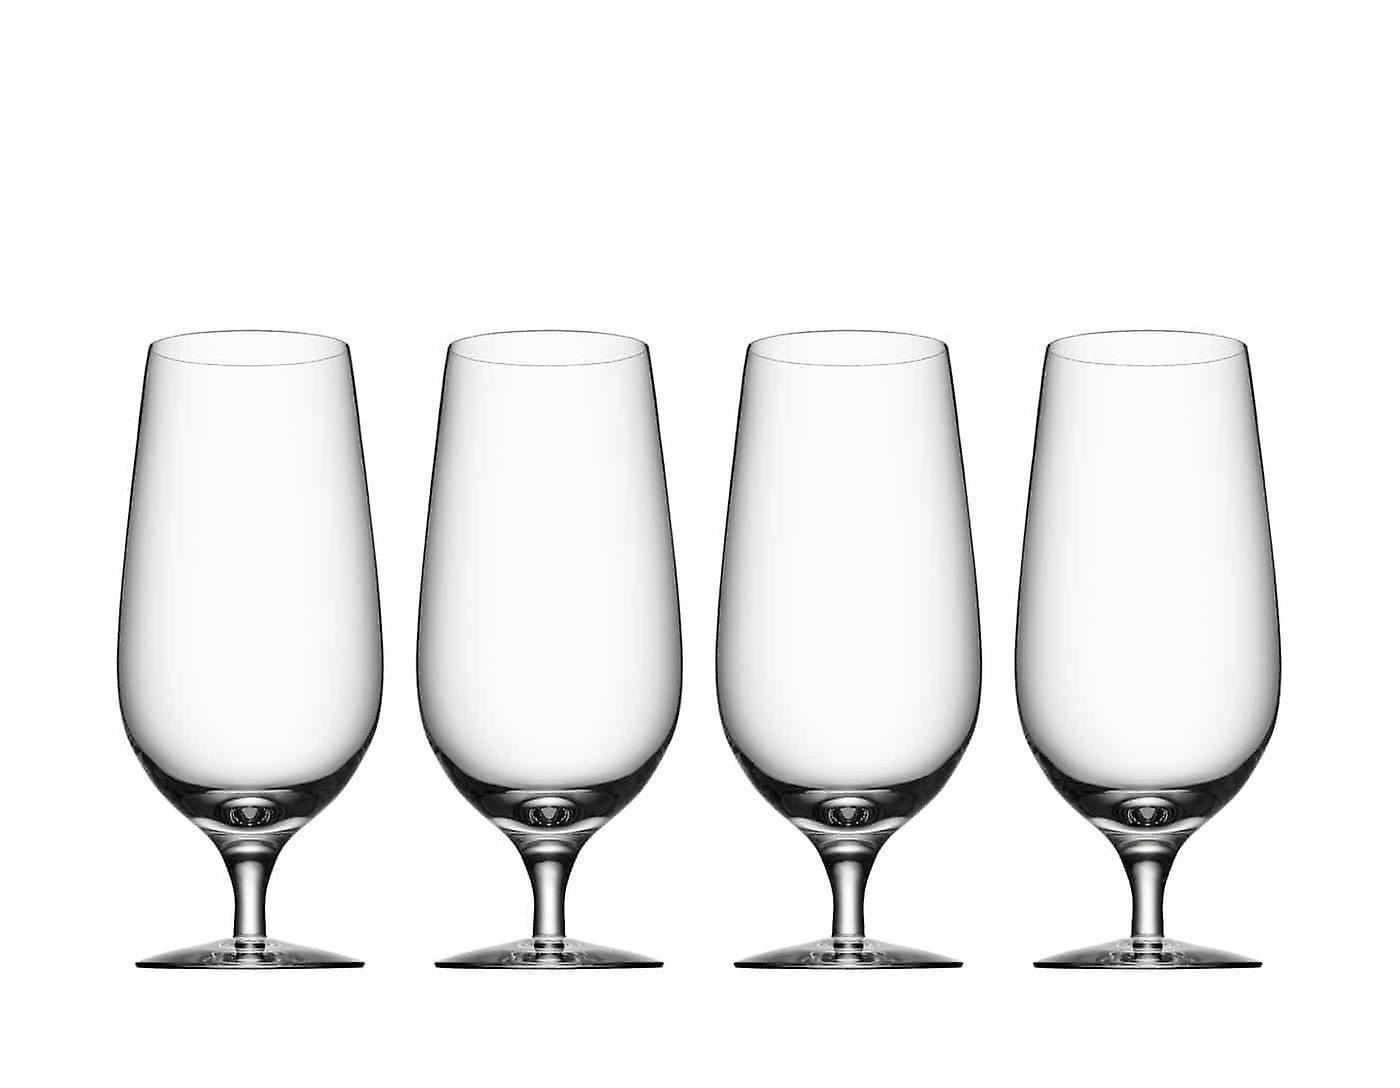 Orrefors - Beer - Lager - 4 st - Ölglas Design Erika Lagerbielke